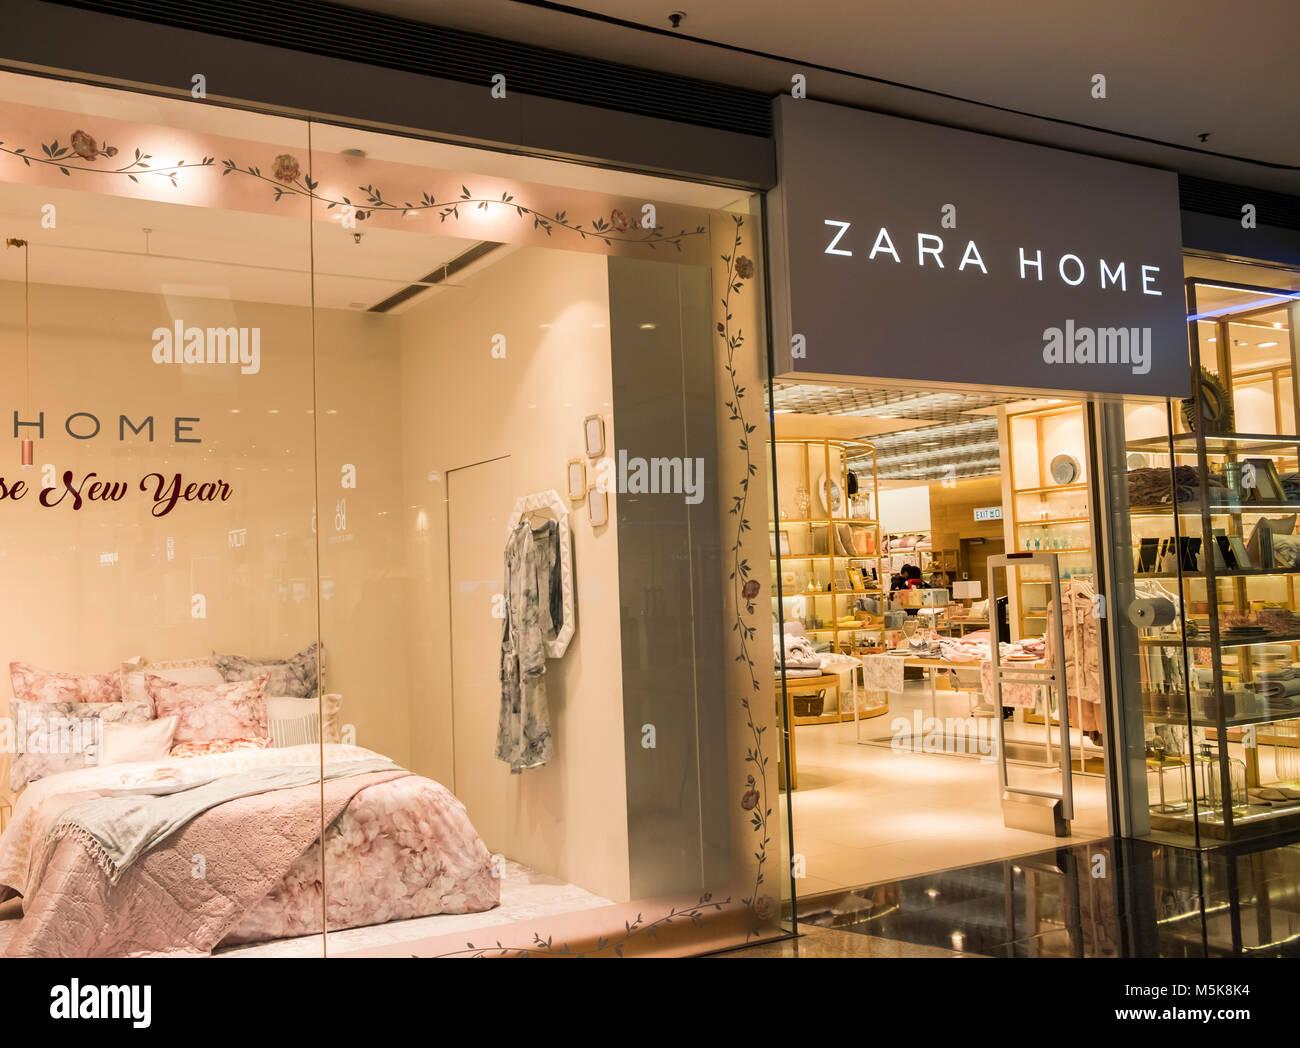 152403a5 Zara Home Store Stock Photos & Zara Home Store Stock Images - Alamy